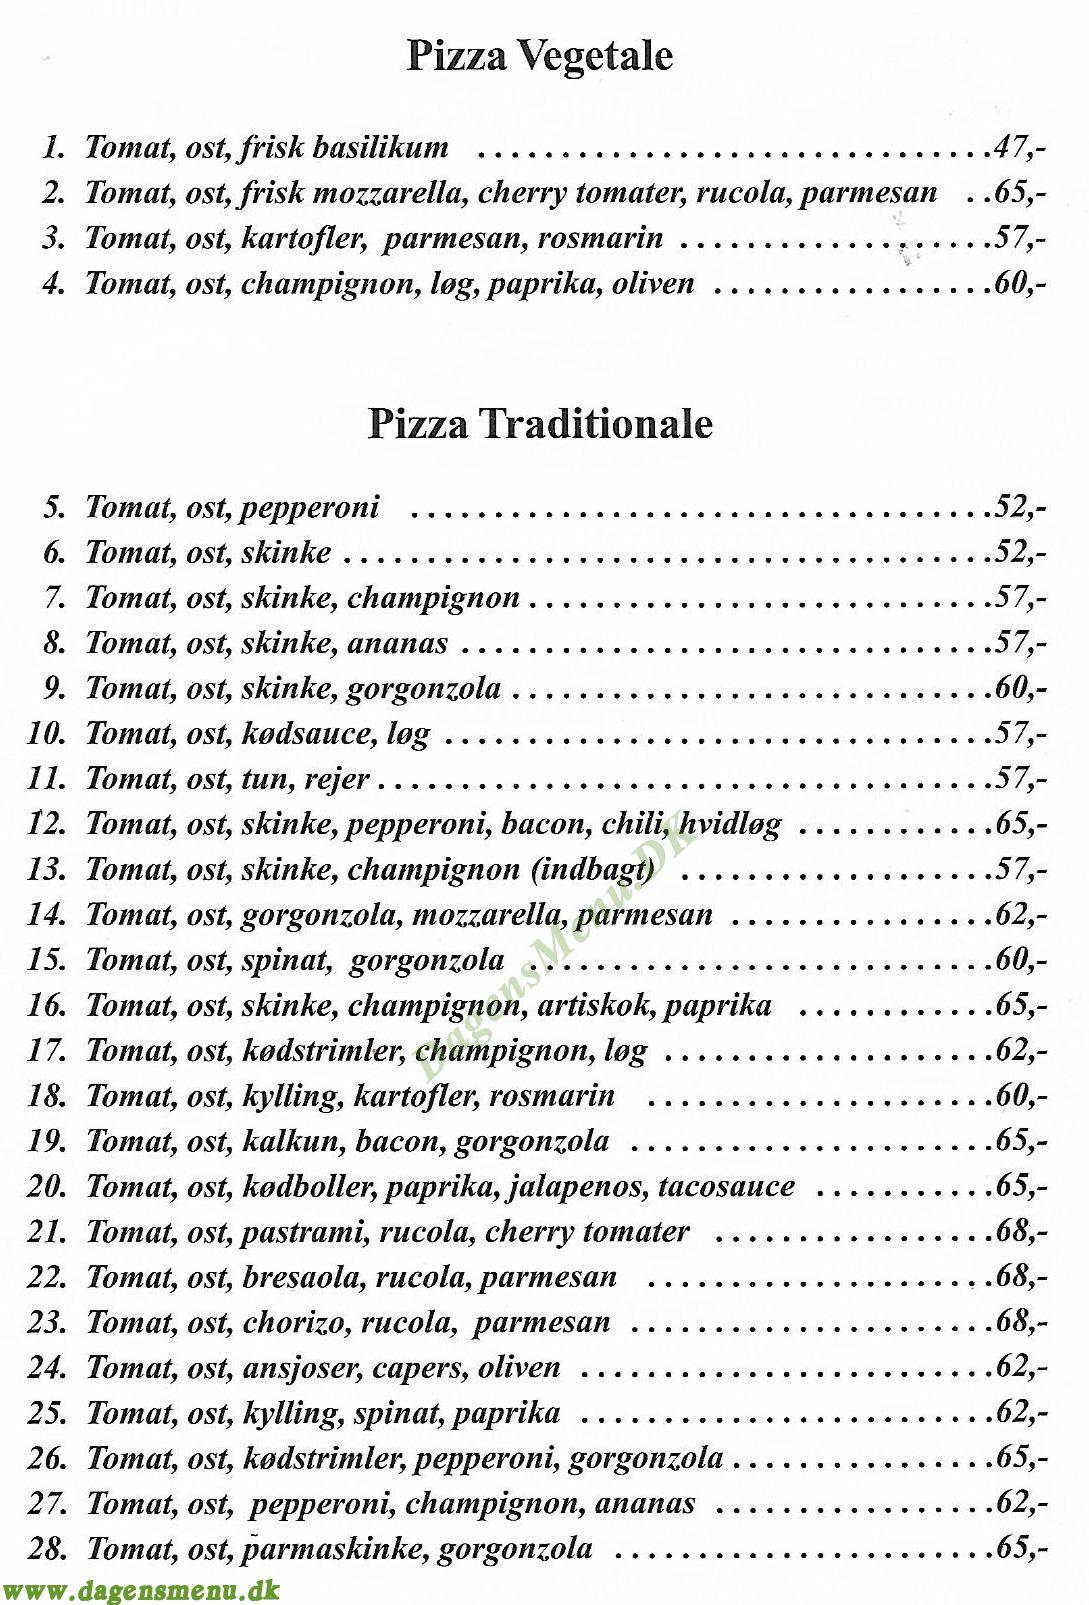 Mo's Pizza - Menukort